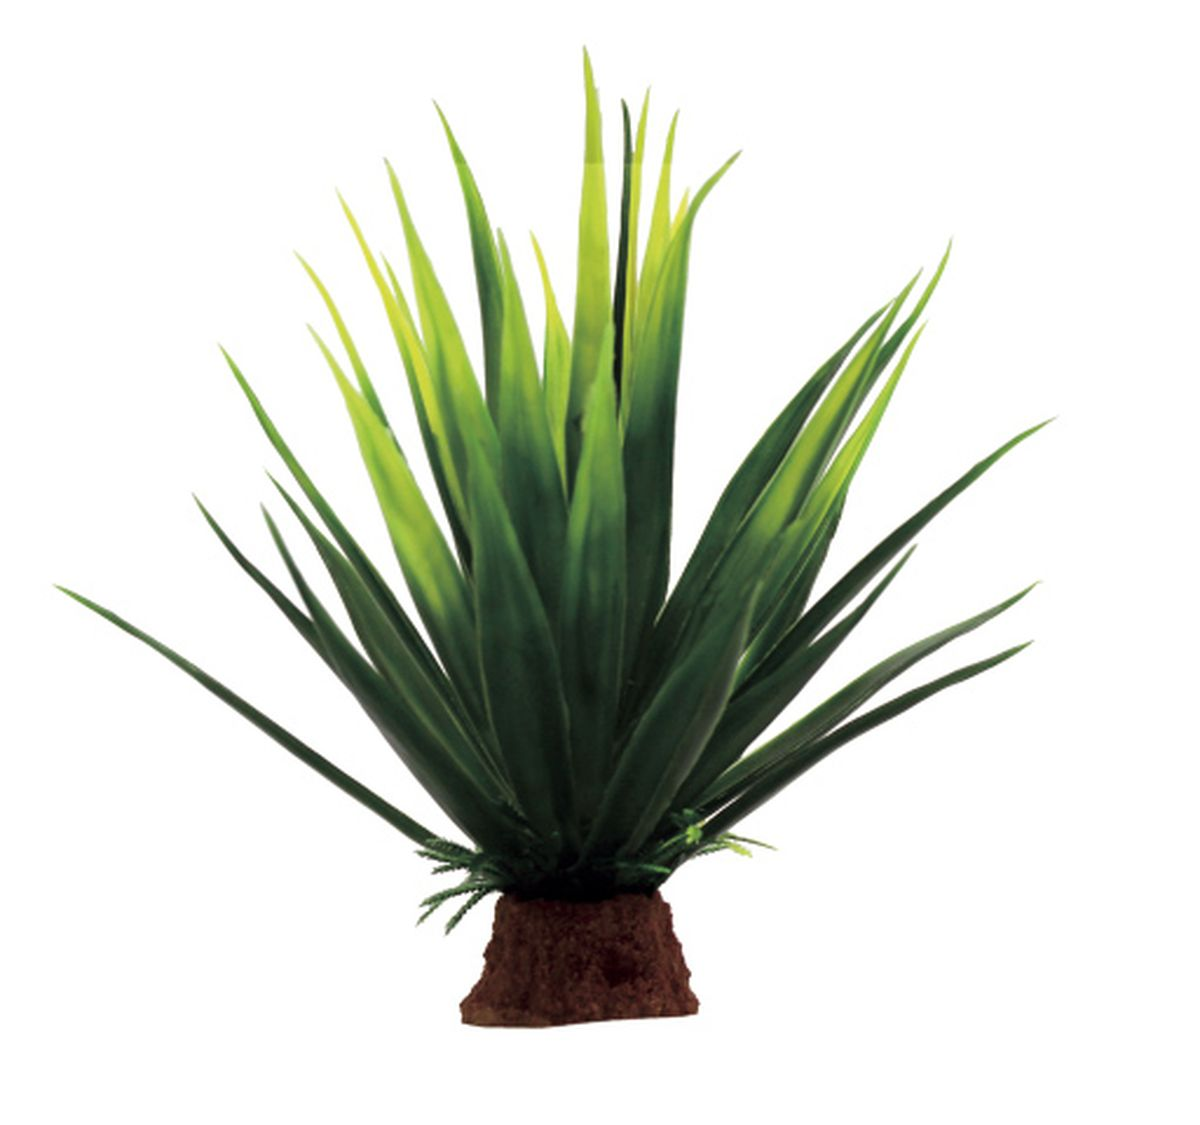 Растение для аквариума ArtUniq Агава, 13 x 13 x 16 см0120710Растение для аквариума ArtUniq Агава, 13 x 13 x 16 см